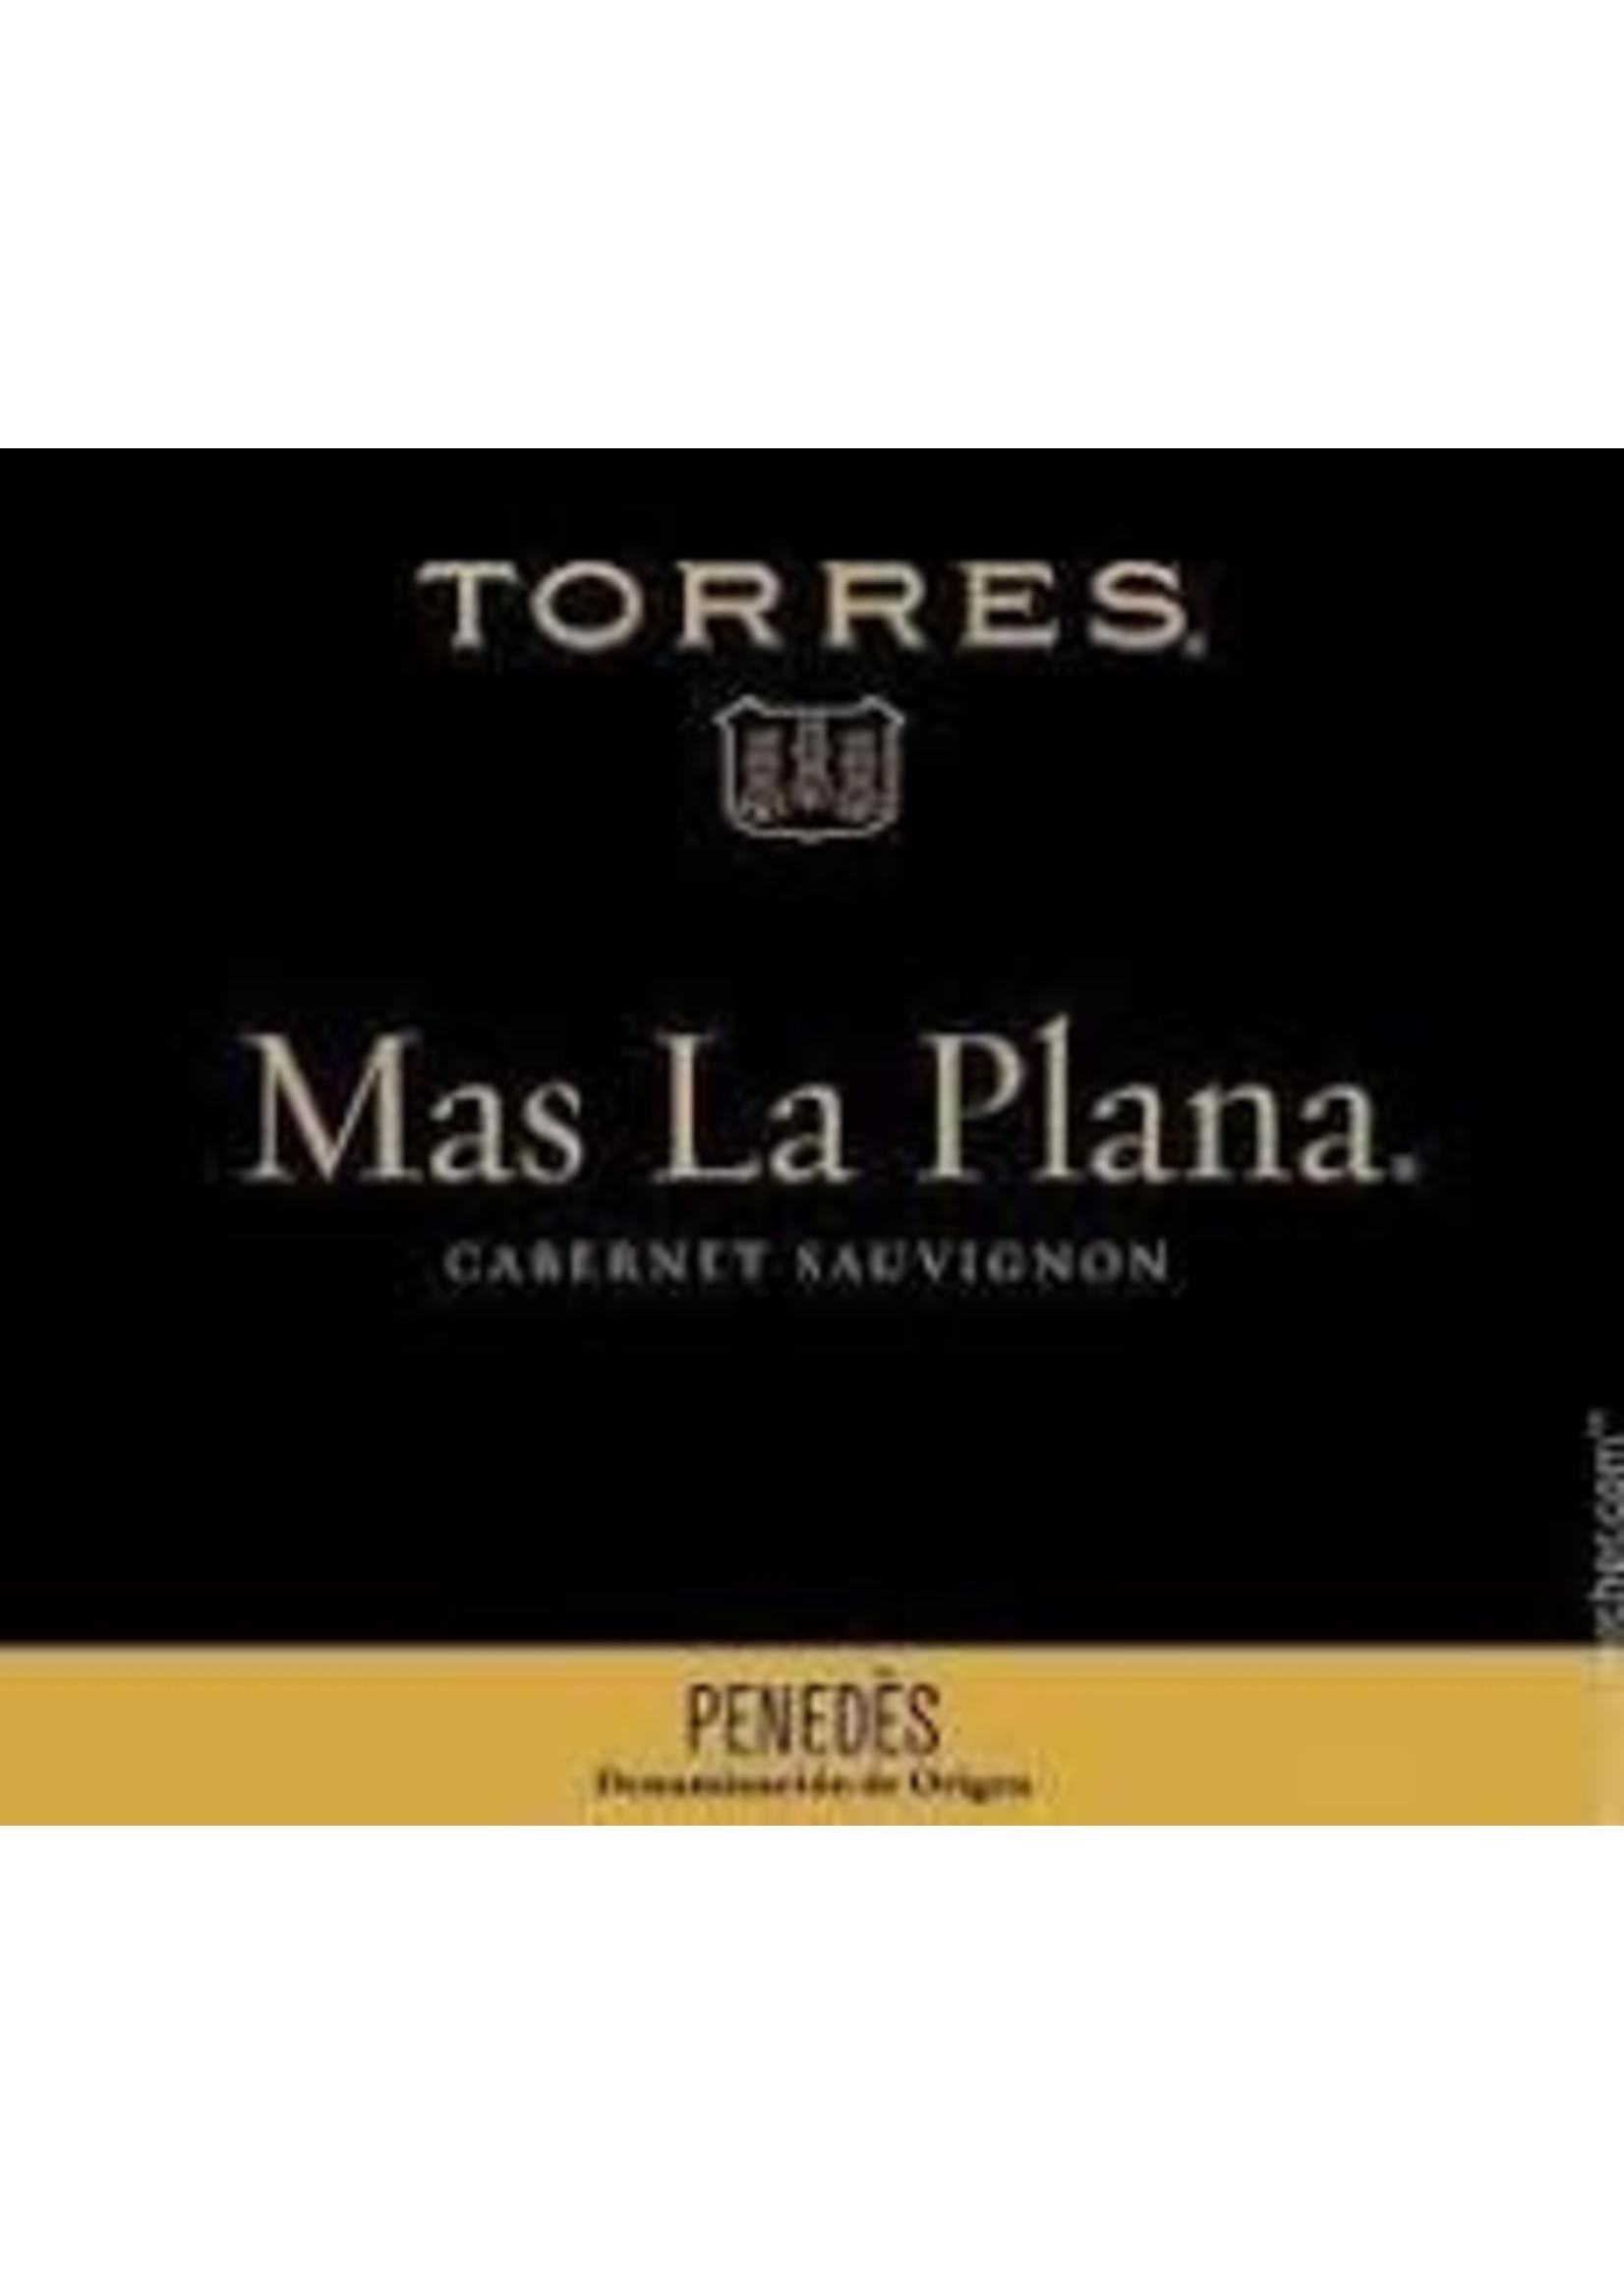 Torres 2015 Mas La Plana Cabernet Sauvignon 750ml